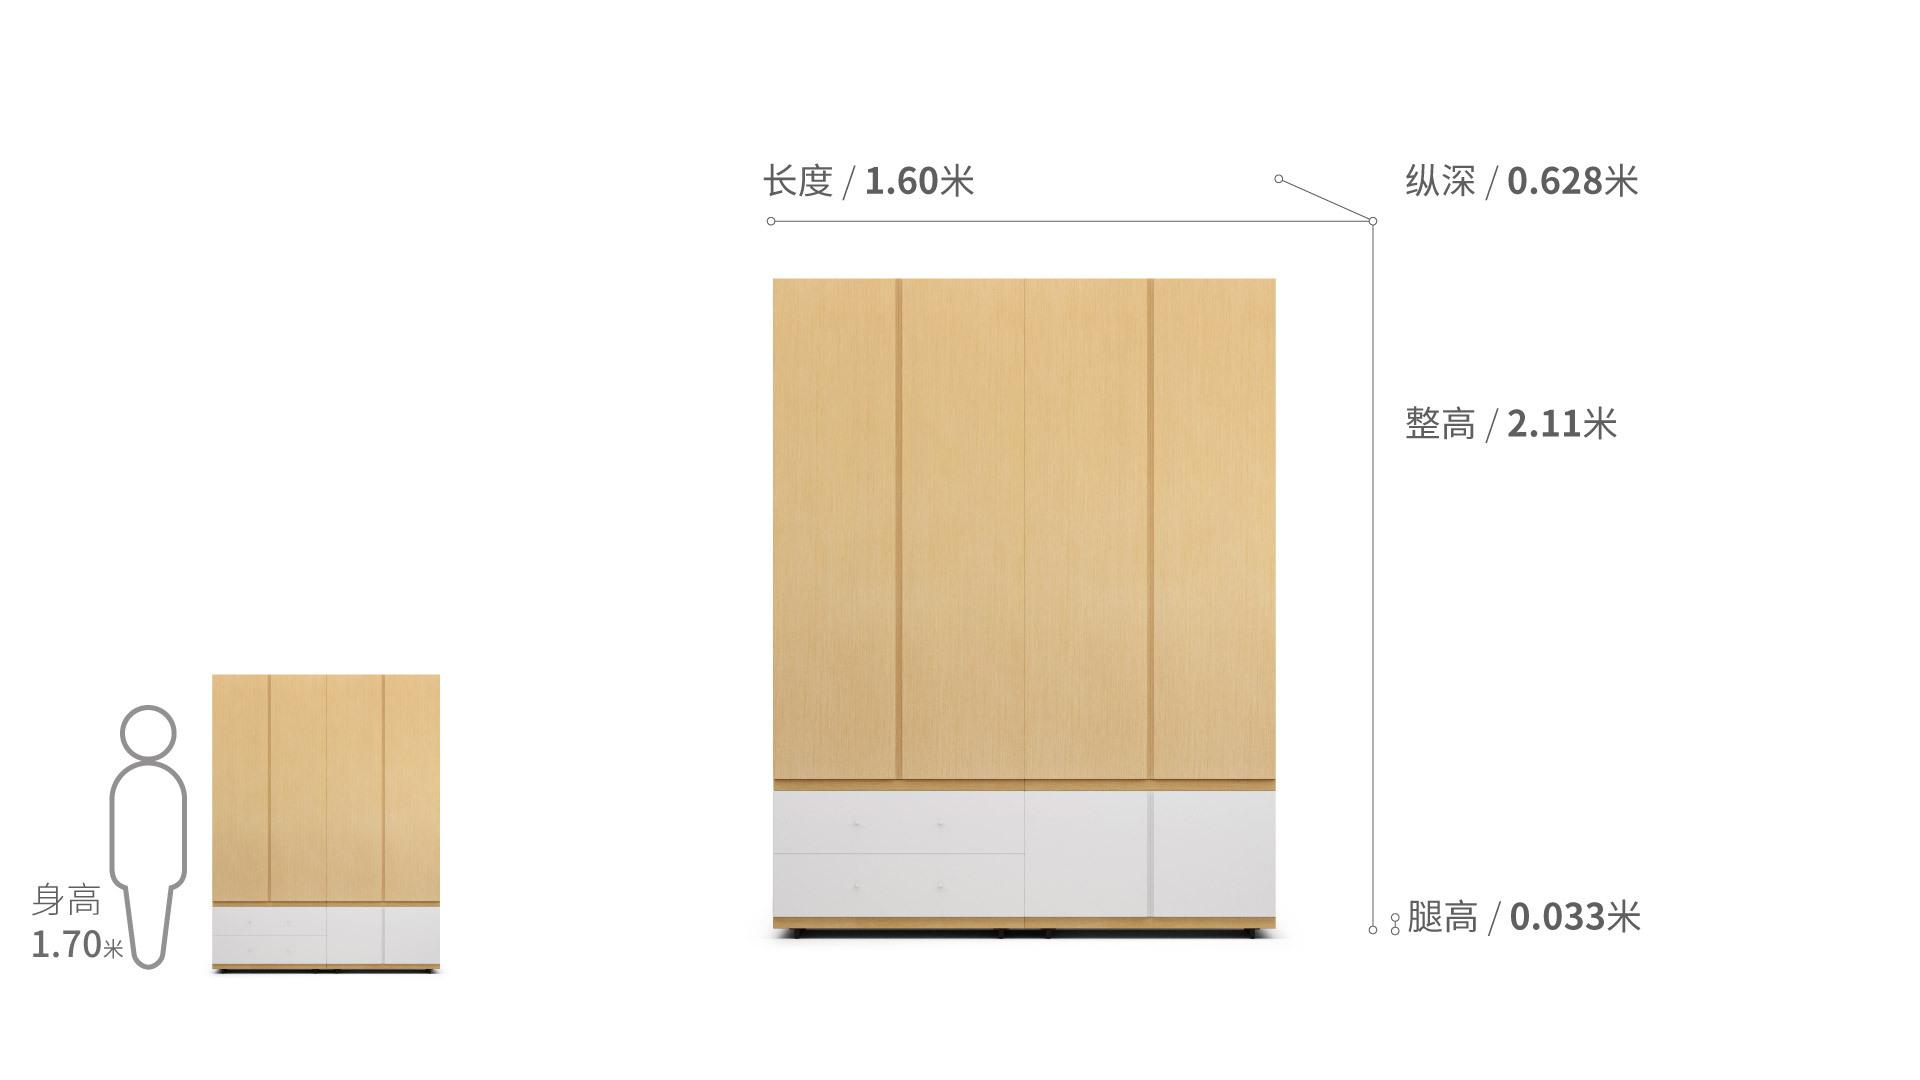 COSMO星格™衣柜·斗柜2.1米高4门衣柜COSMO效果图